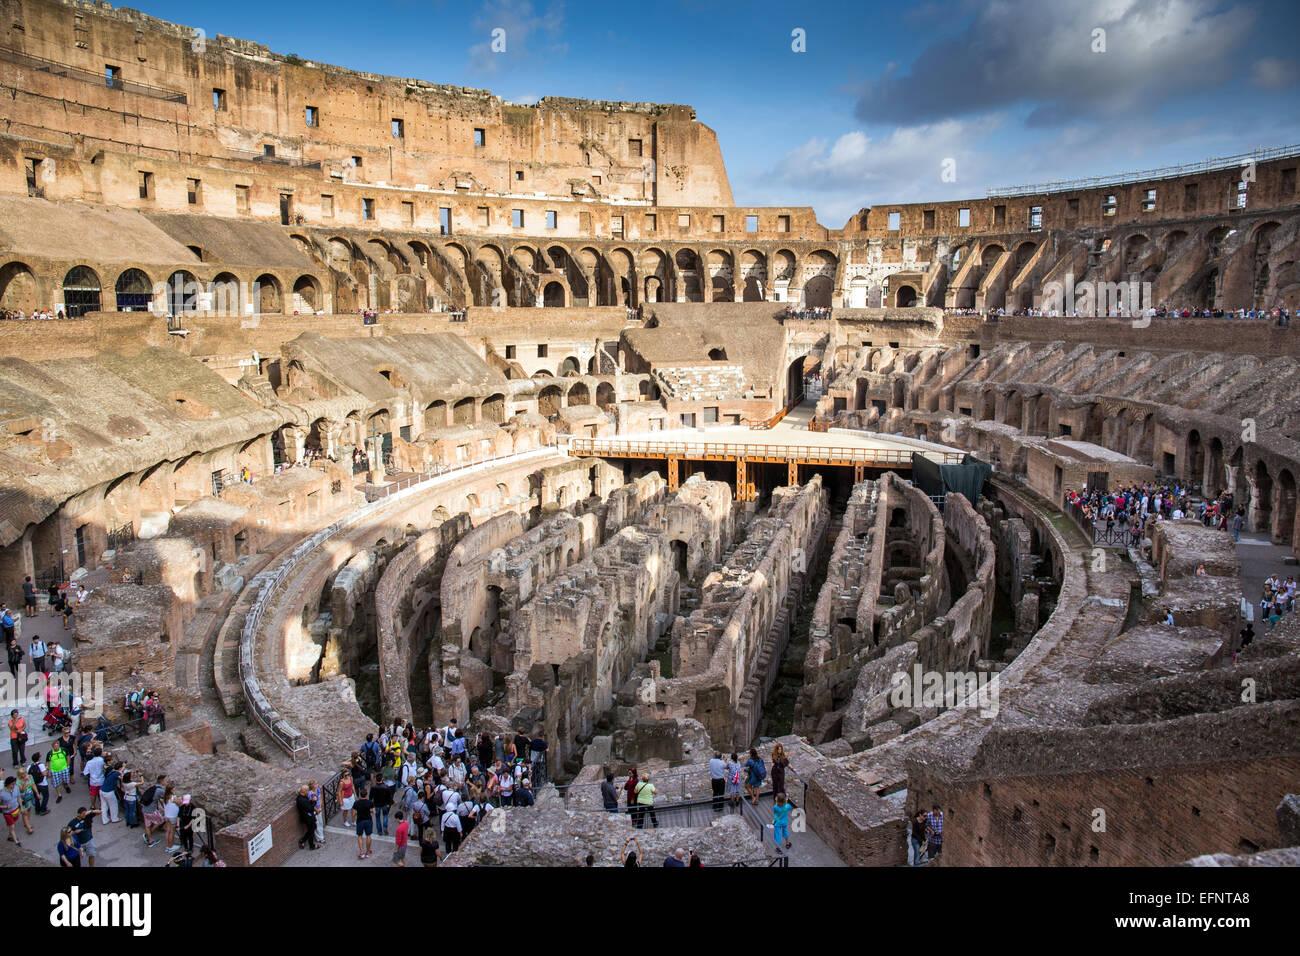 Crowd of tourists colosseum coliseum rome italy europe stock crowd of tourists colosseum coliseum rome italy europe publicscrutiny Images